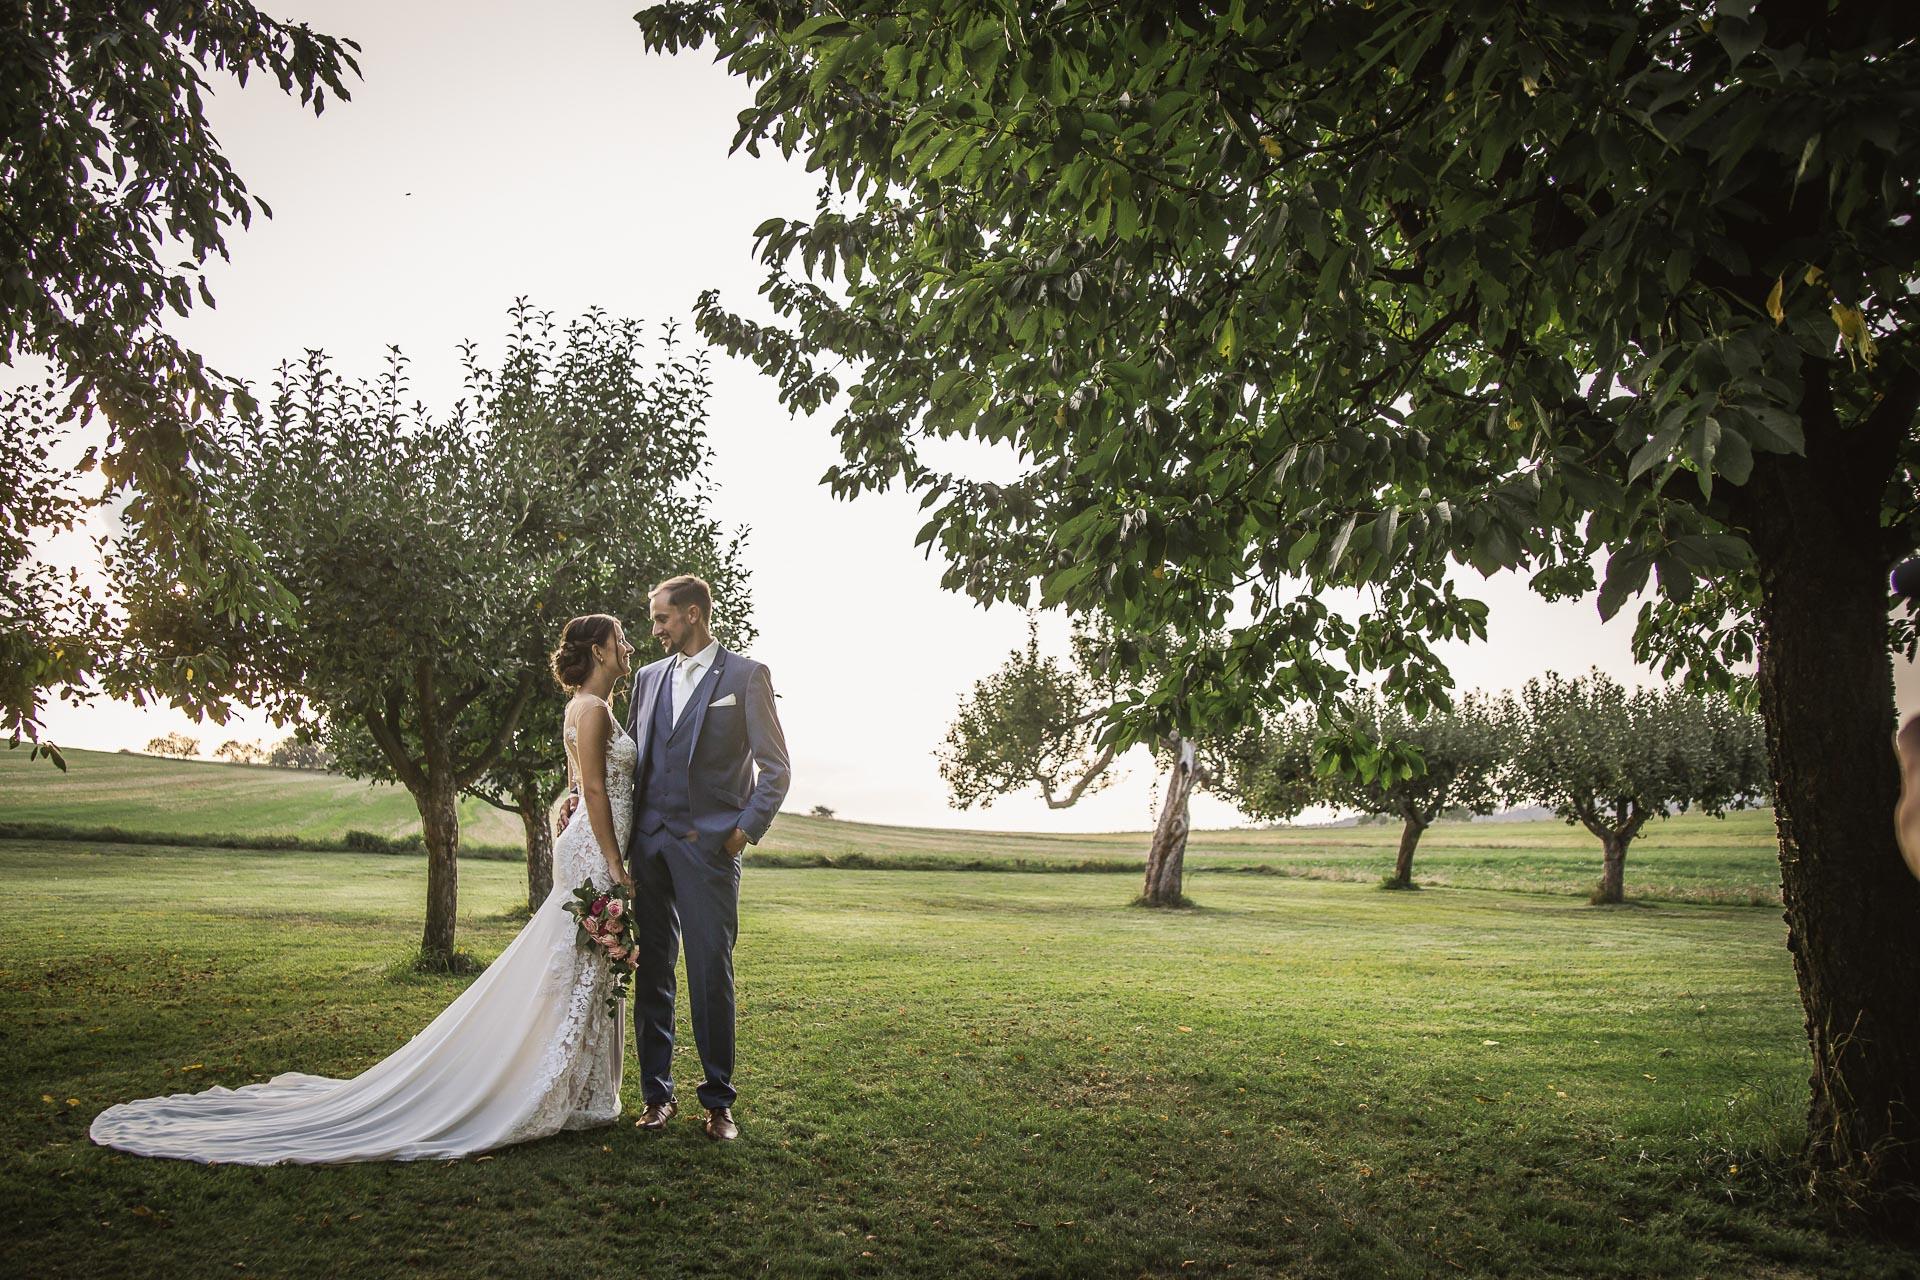 svatební-fotograf-wedding-svatebni-video-orlík-vltava-kostel-statek-stodola-boho-svatba-Beautyfoto-545